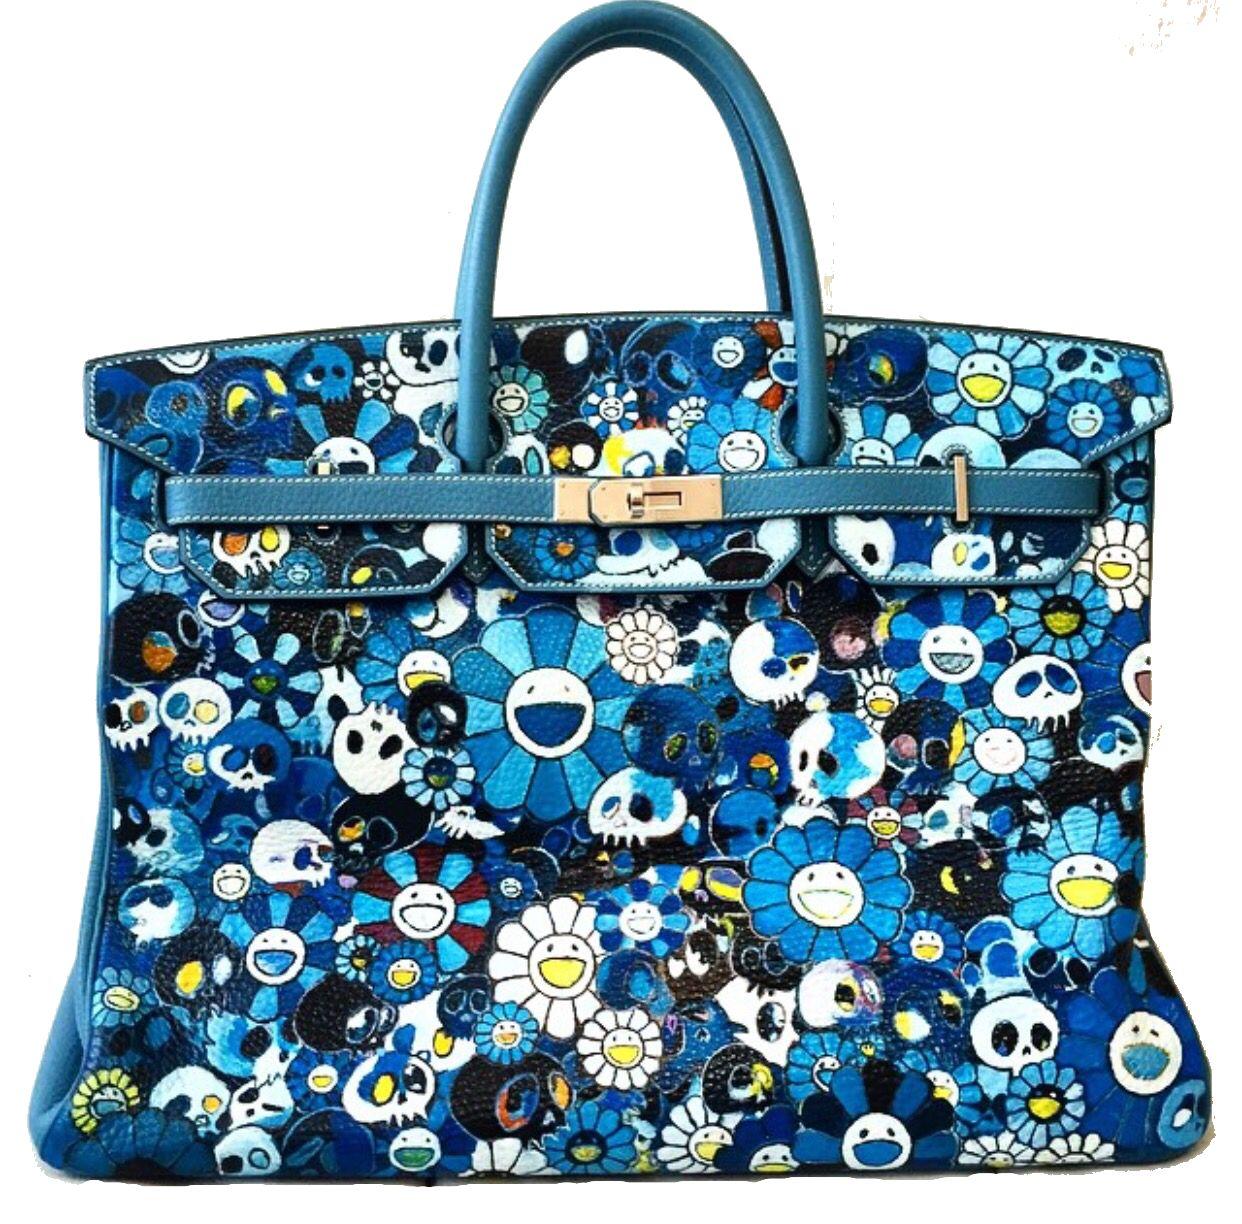 4f2dc06d3a08 Custom Takashi Murakami Painted Birkin Bag